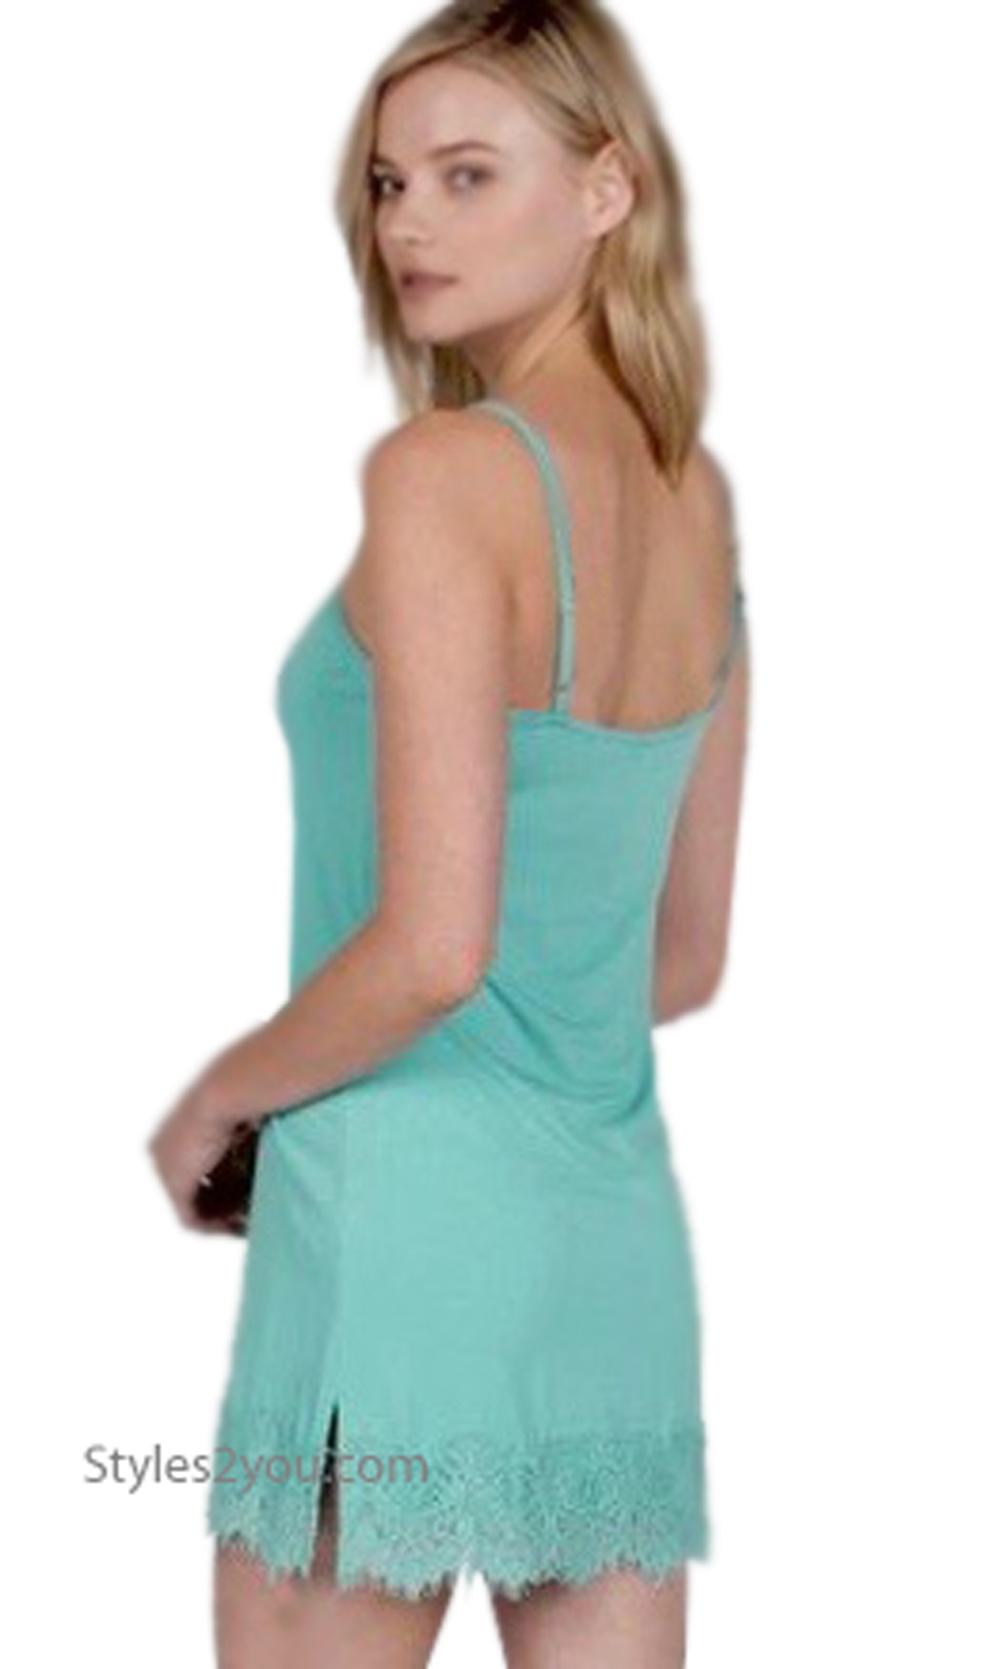 3b3cef7aa825e Renton Shirt Extender Slip Dress Cami With Eyelash Trim Sea Blue · «